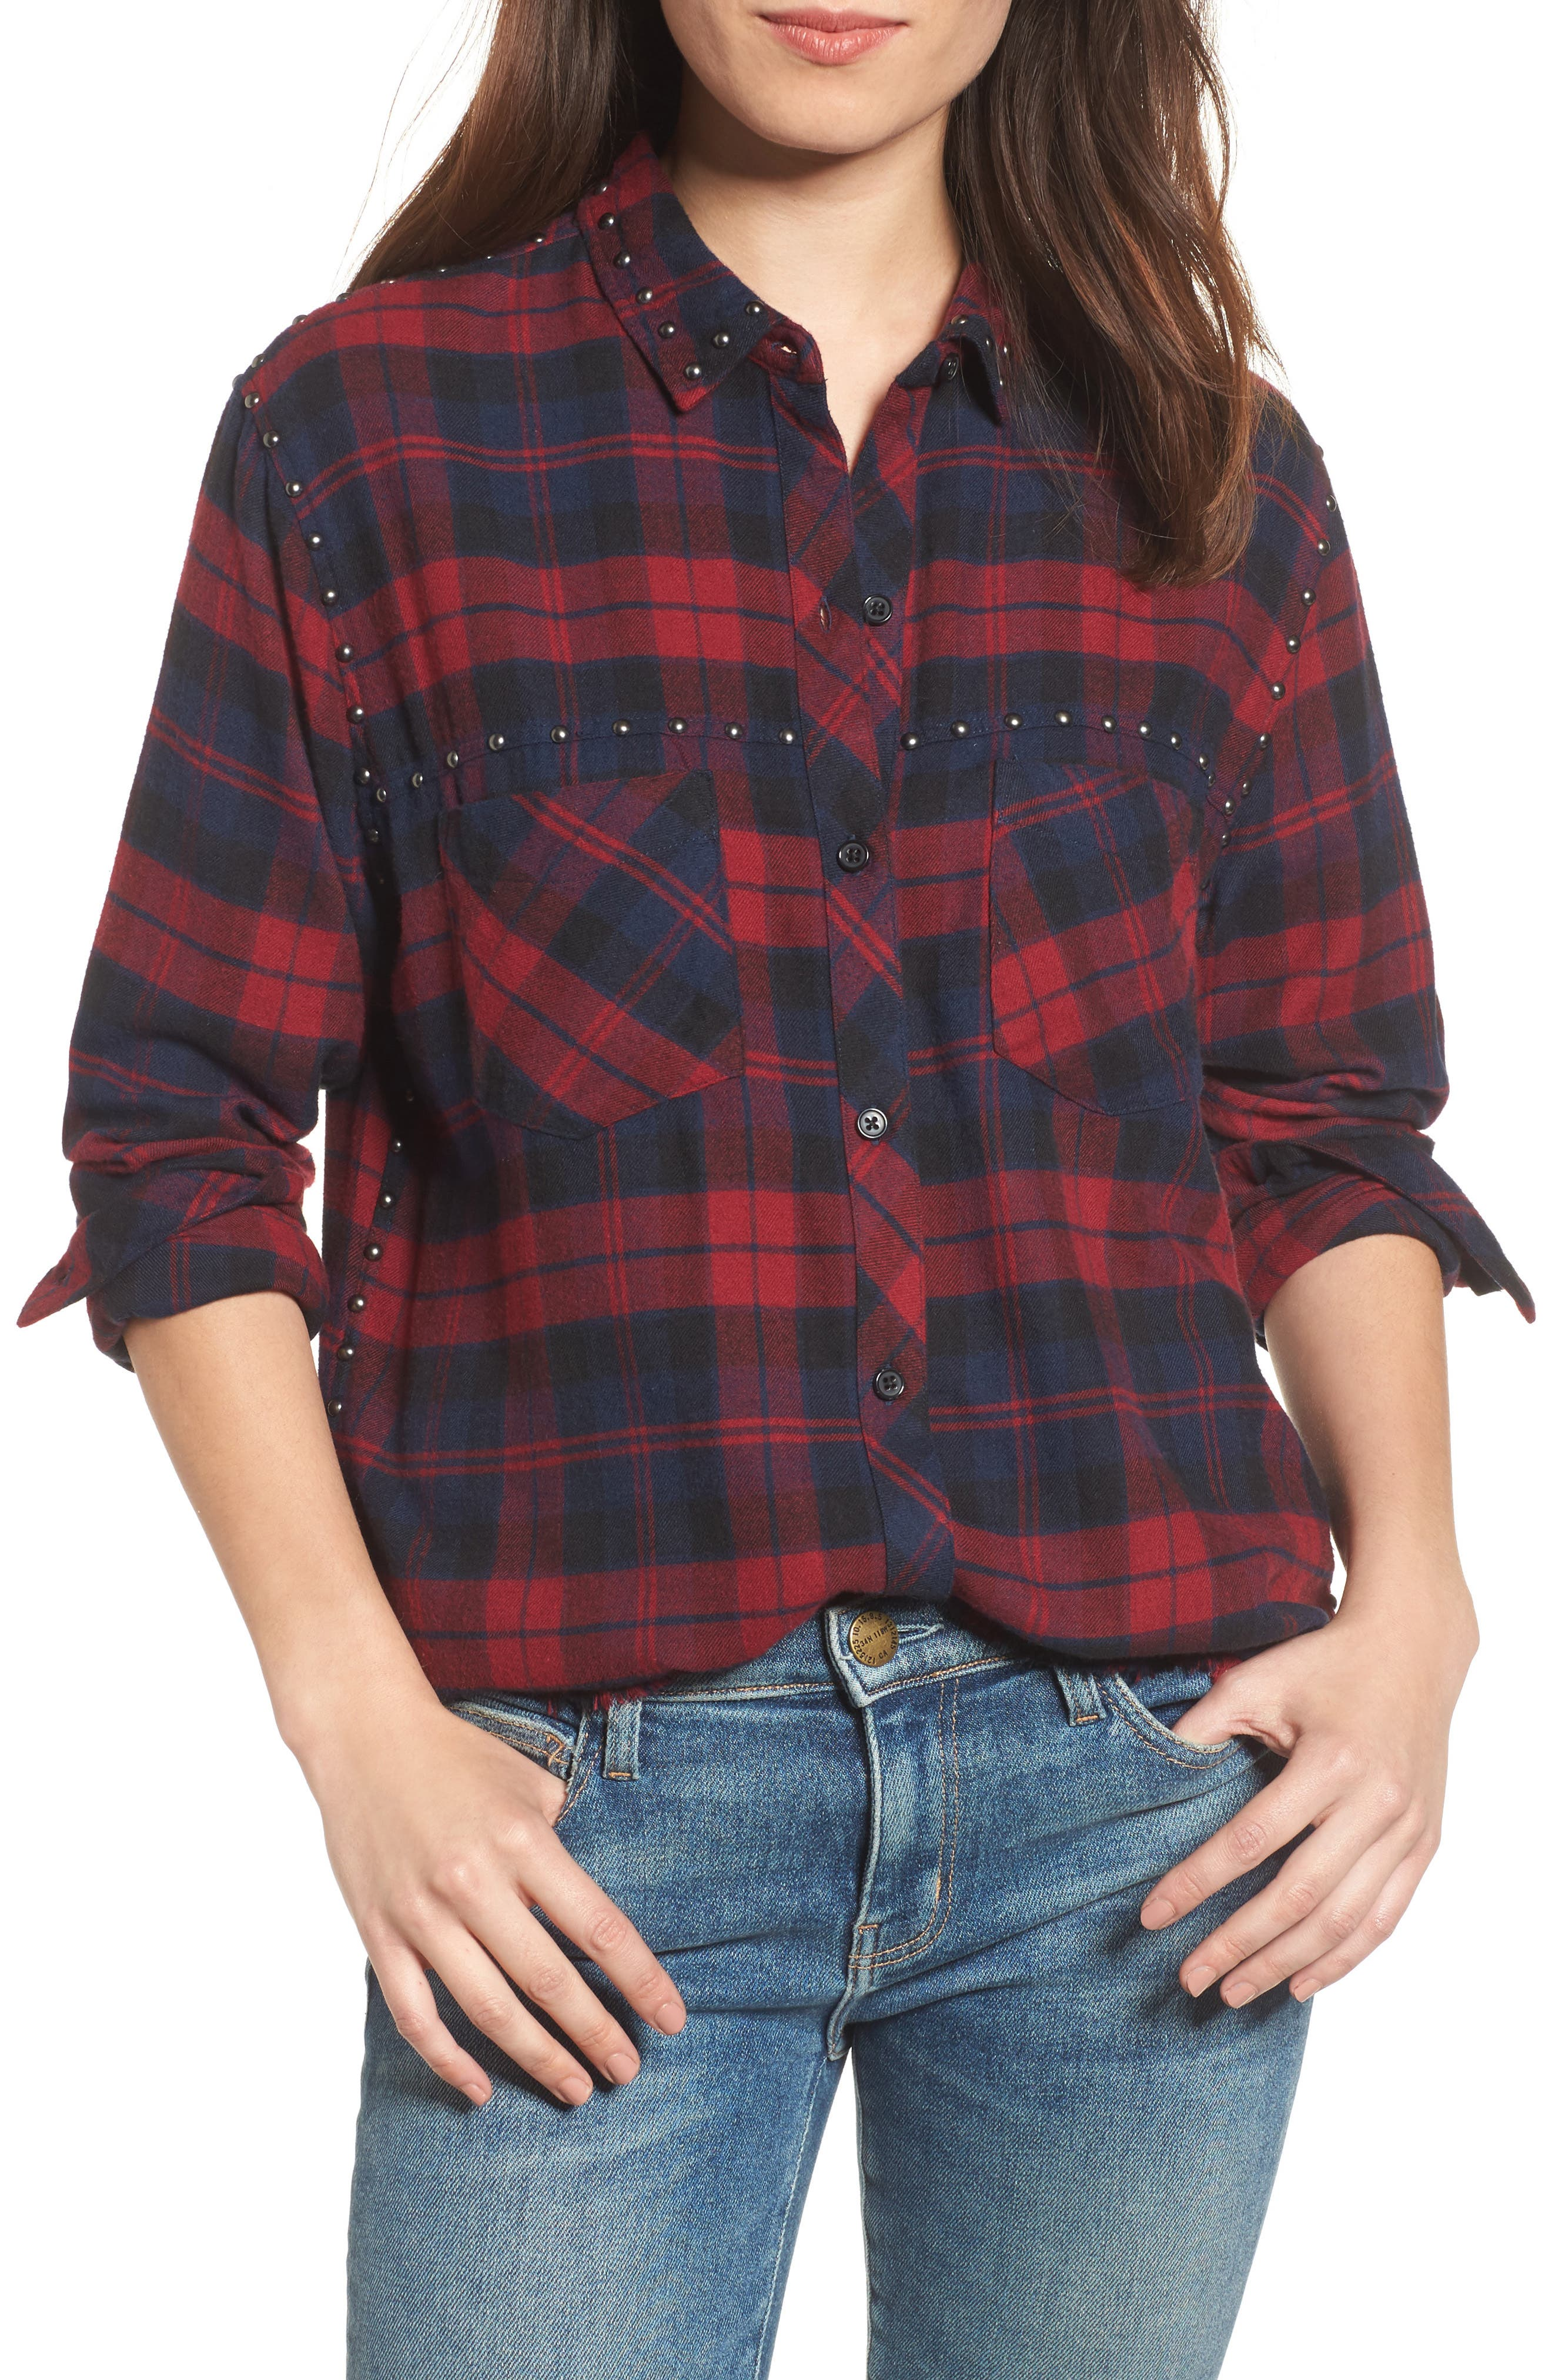 Alternate Image 1 Selected - Rails Rex Studded Plaid Shirt